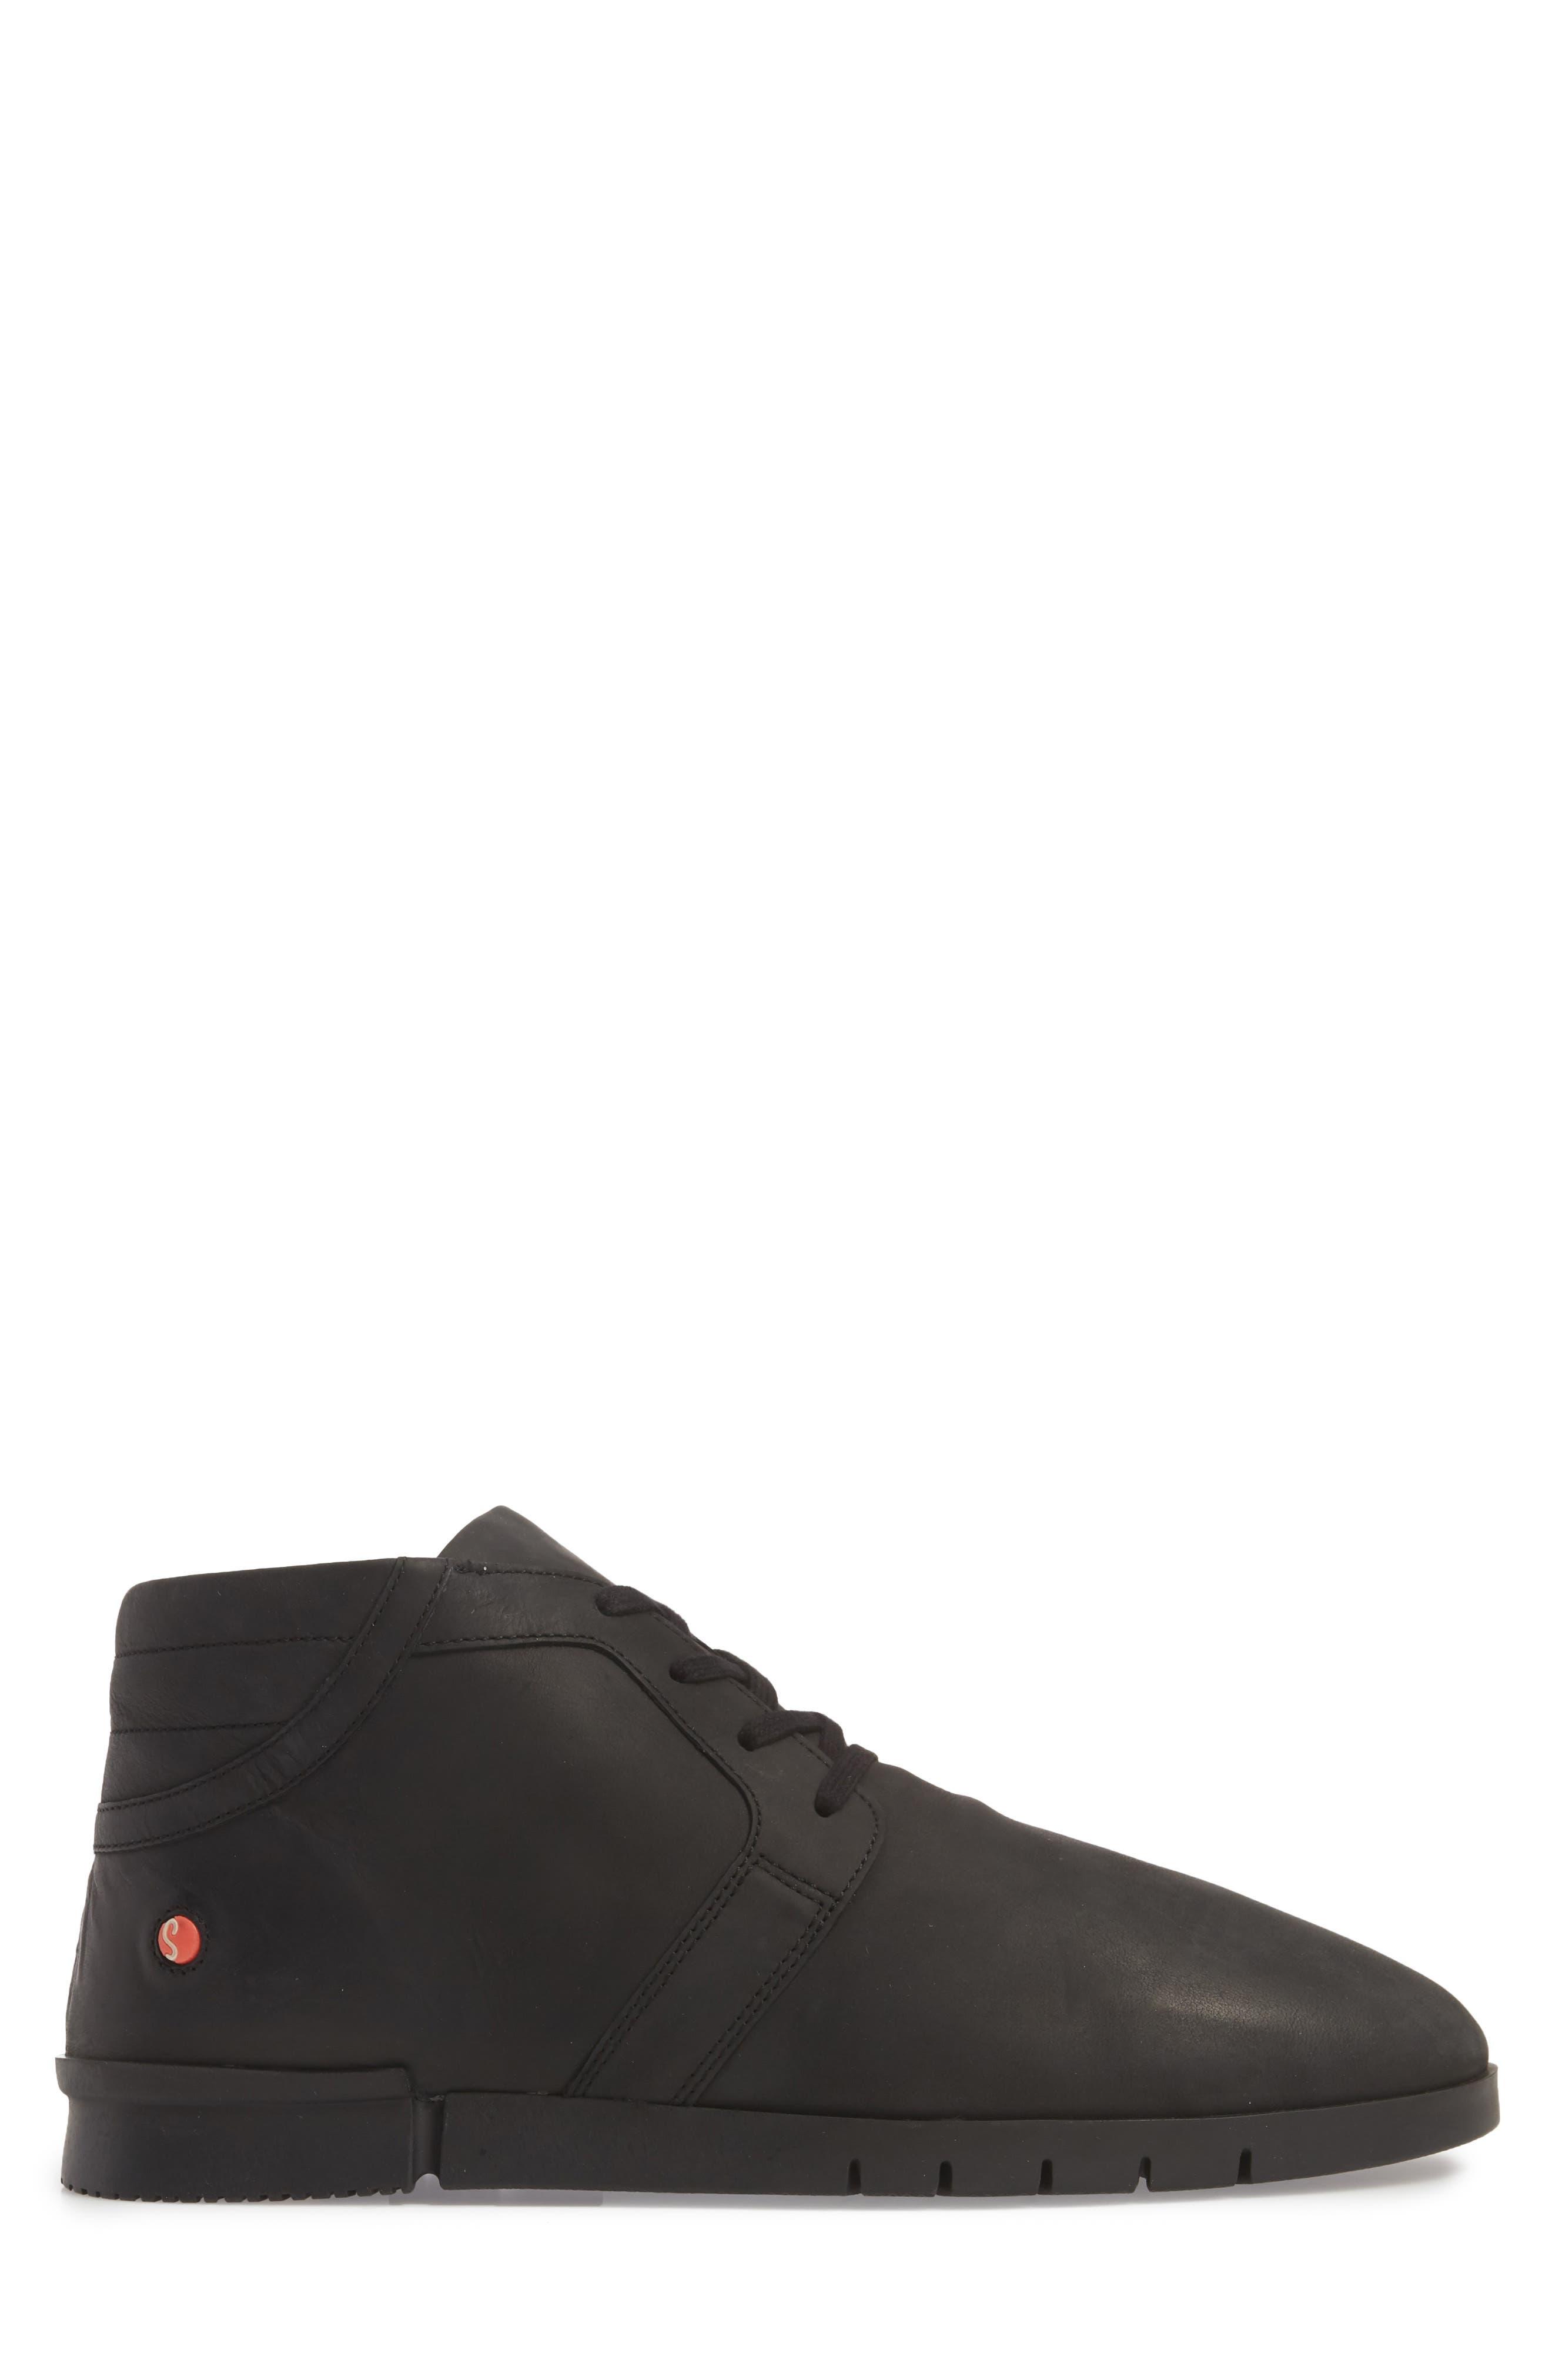 Cul Boot,                             Alternate thumbnail 4, color,                             Black Corgi Leather